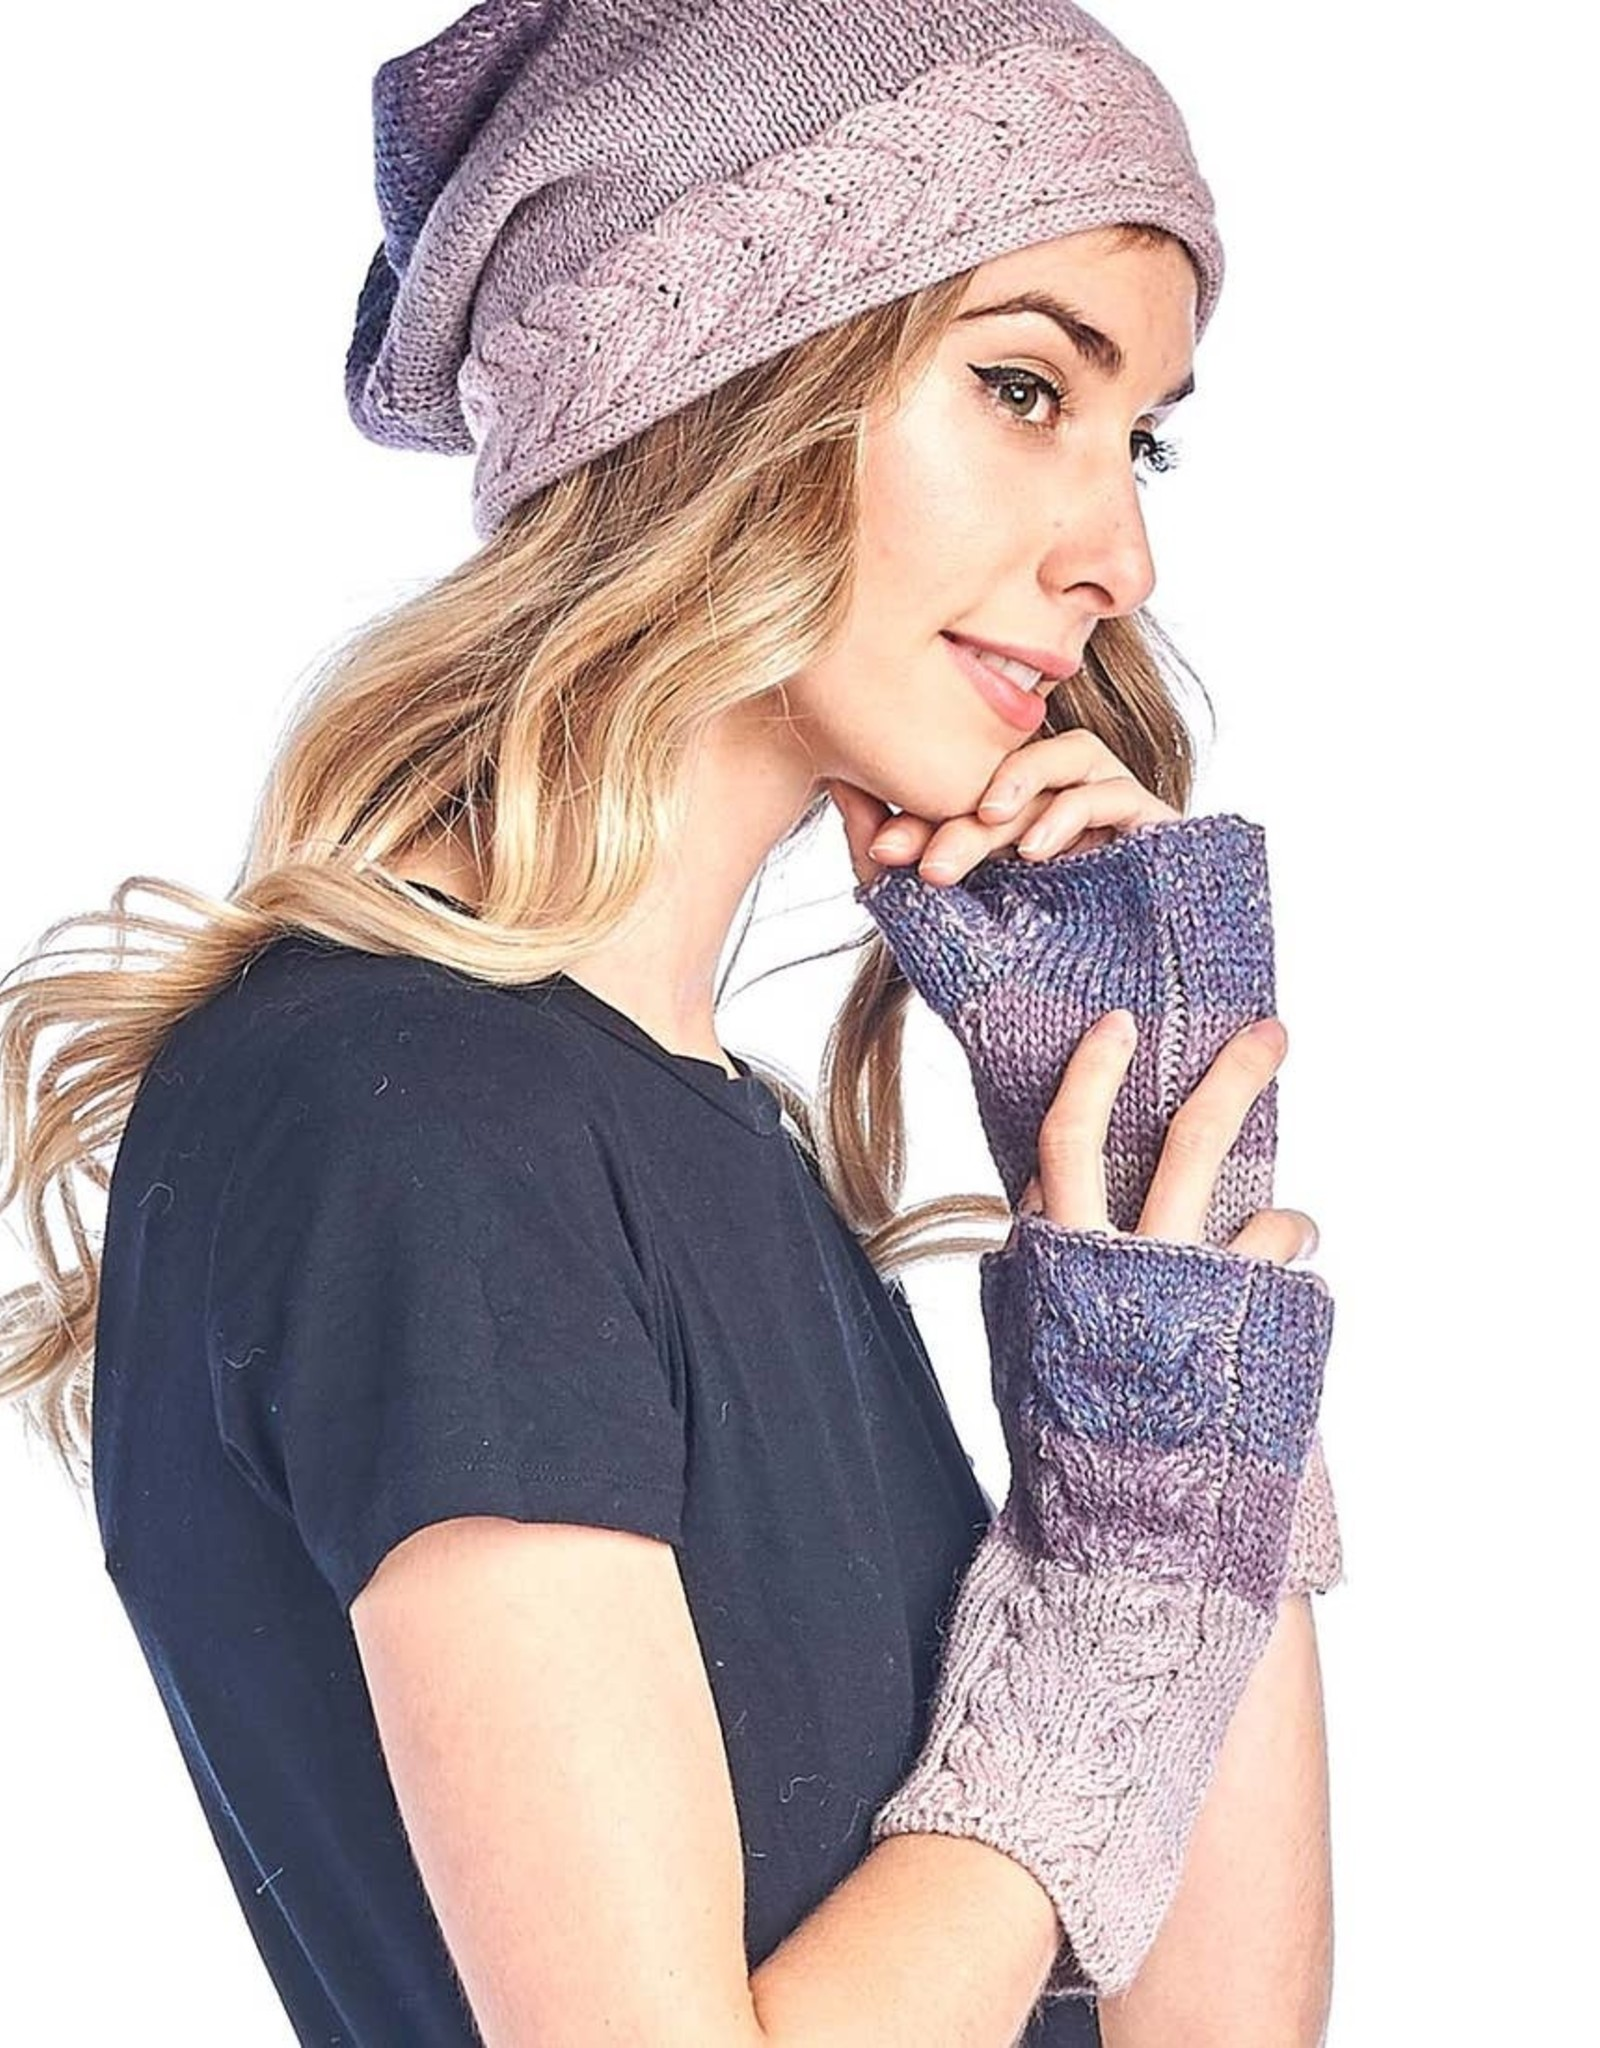 Shupaca Alpaca Fingerless Alpaca Gloves - Fade - Berry